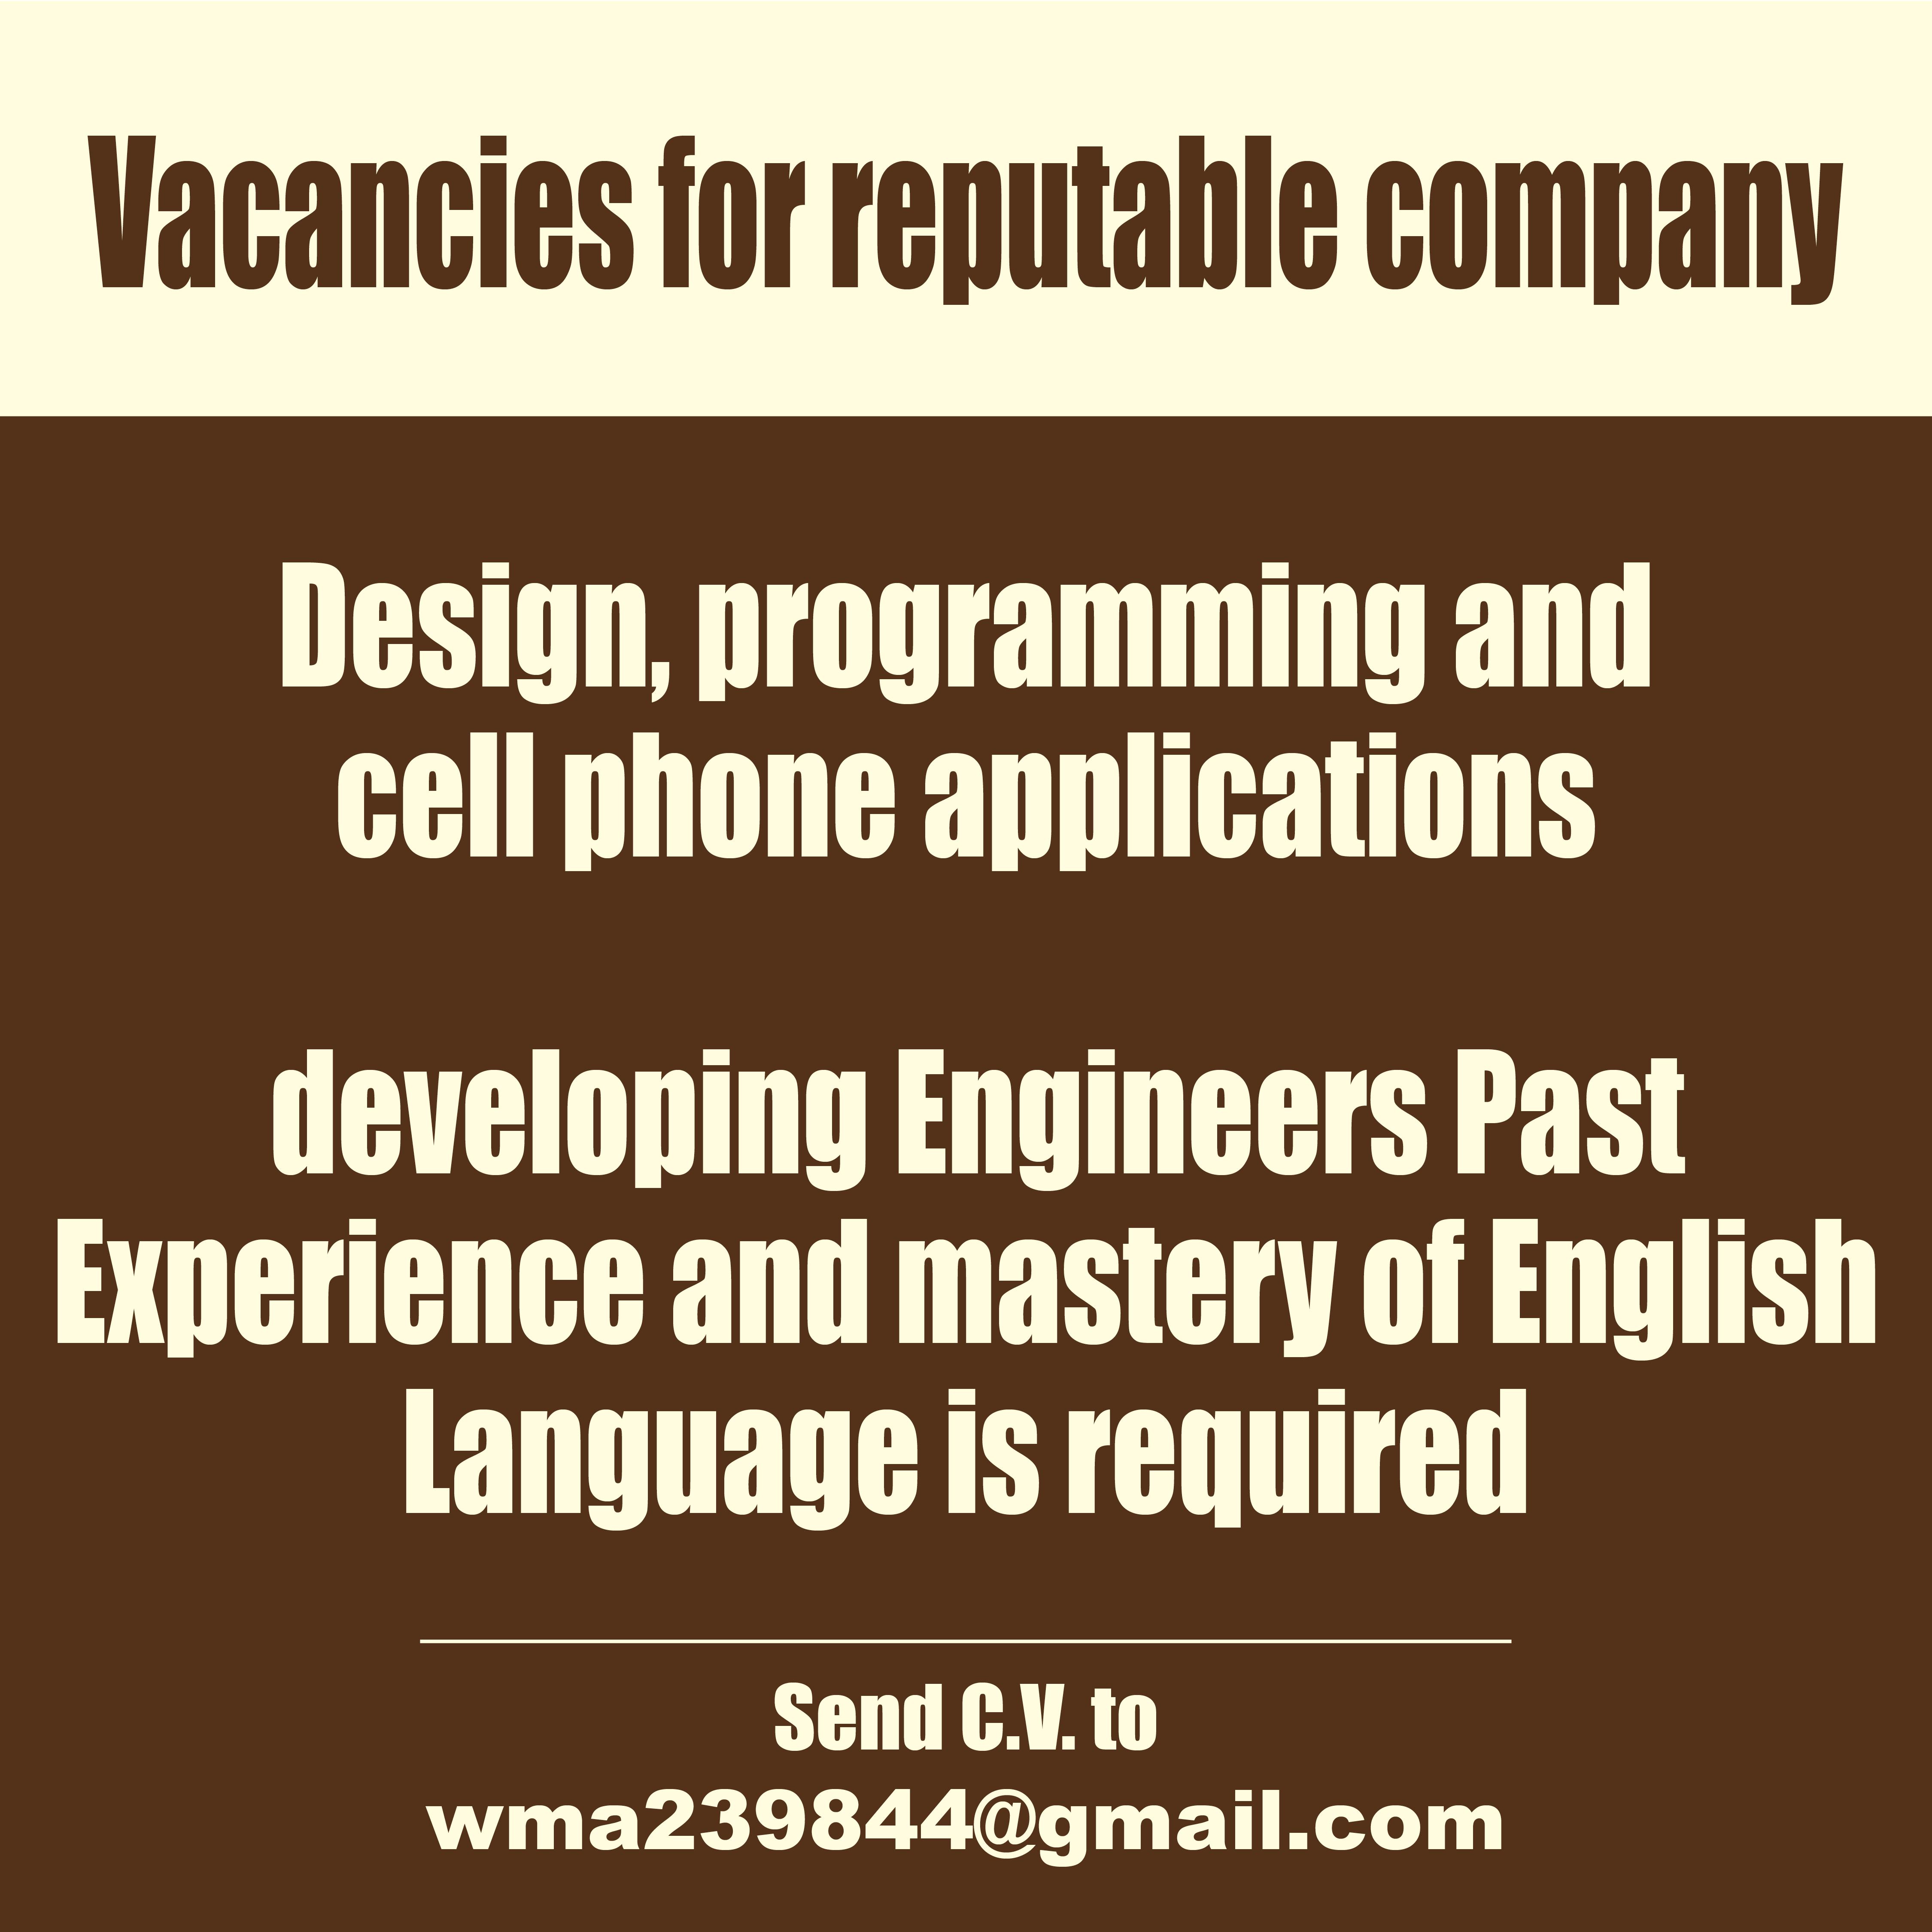 Vacancies for reputable company